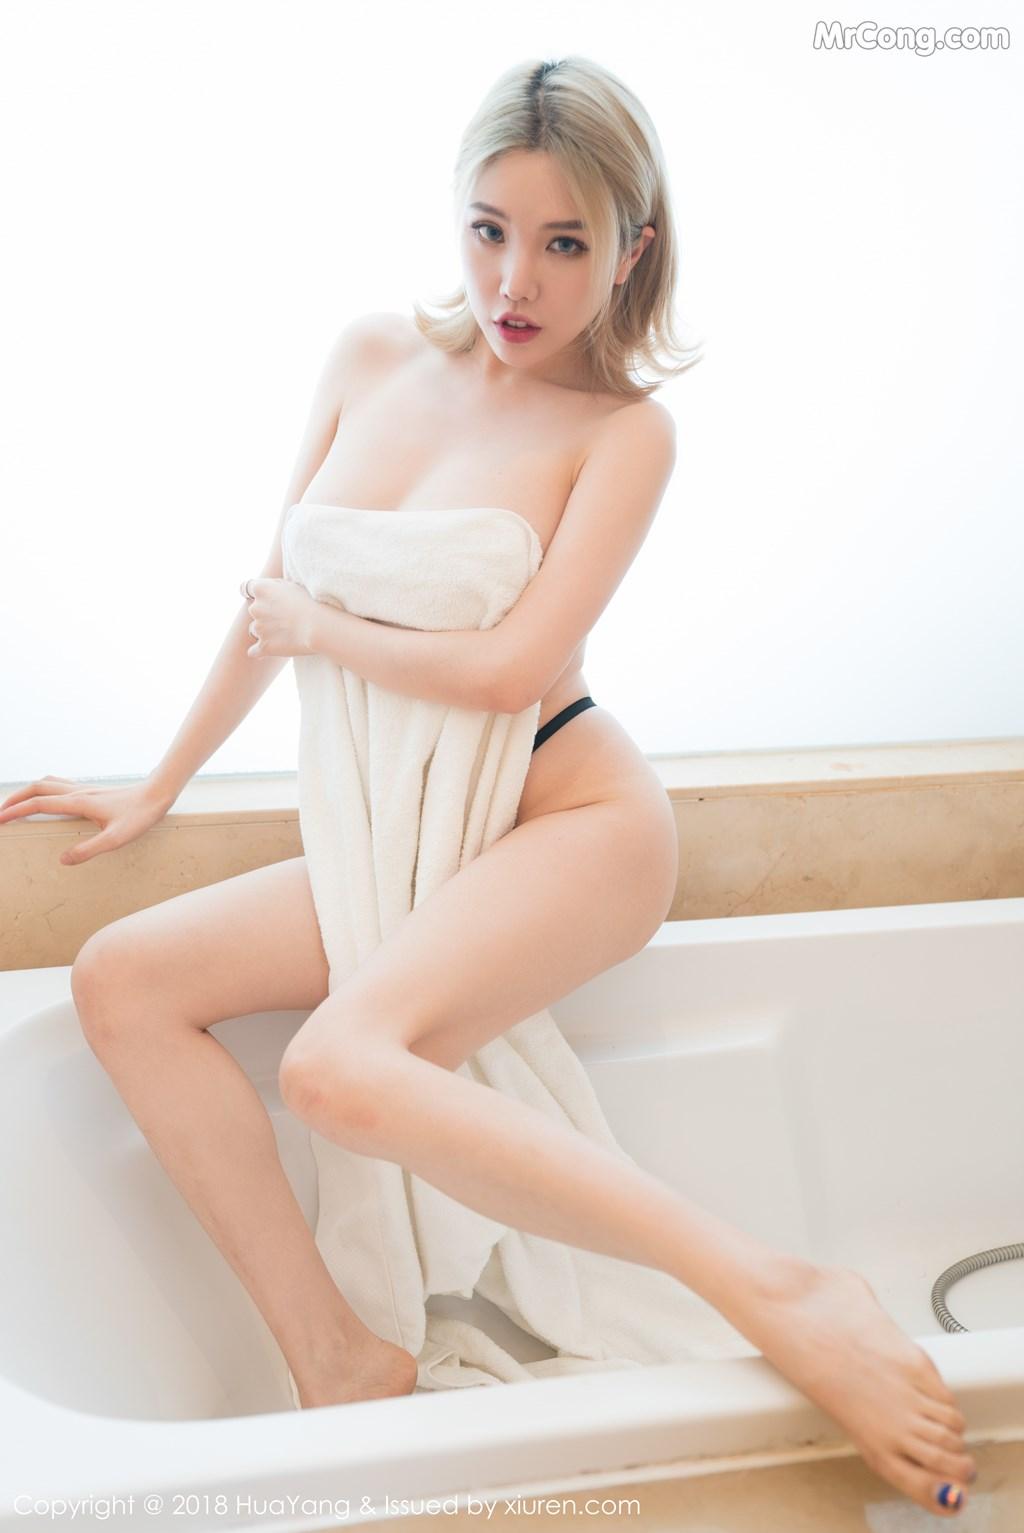 Image HuaYang-2018-08-22-Vol.074-Huang-Le-Ran-MrCong.com-006 in post HuaYang 2018-08-22 Vol.074: Người mẫu Huang Le Ran (黄楽然) (48 ảnh)